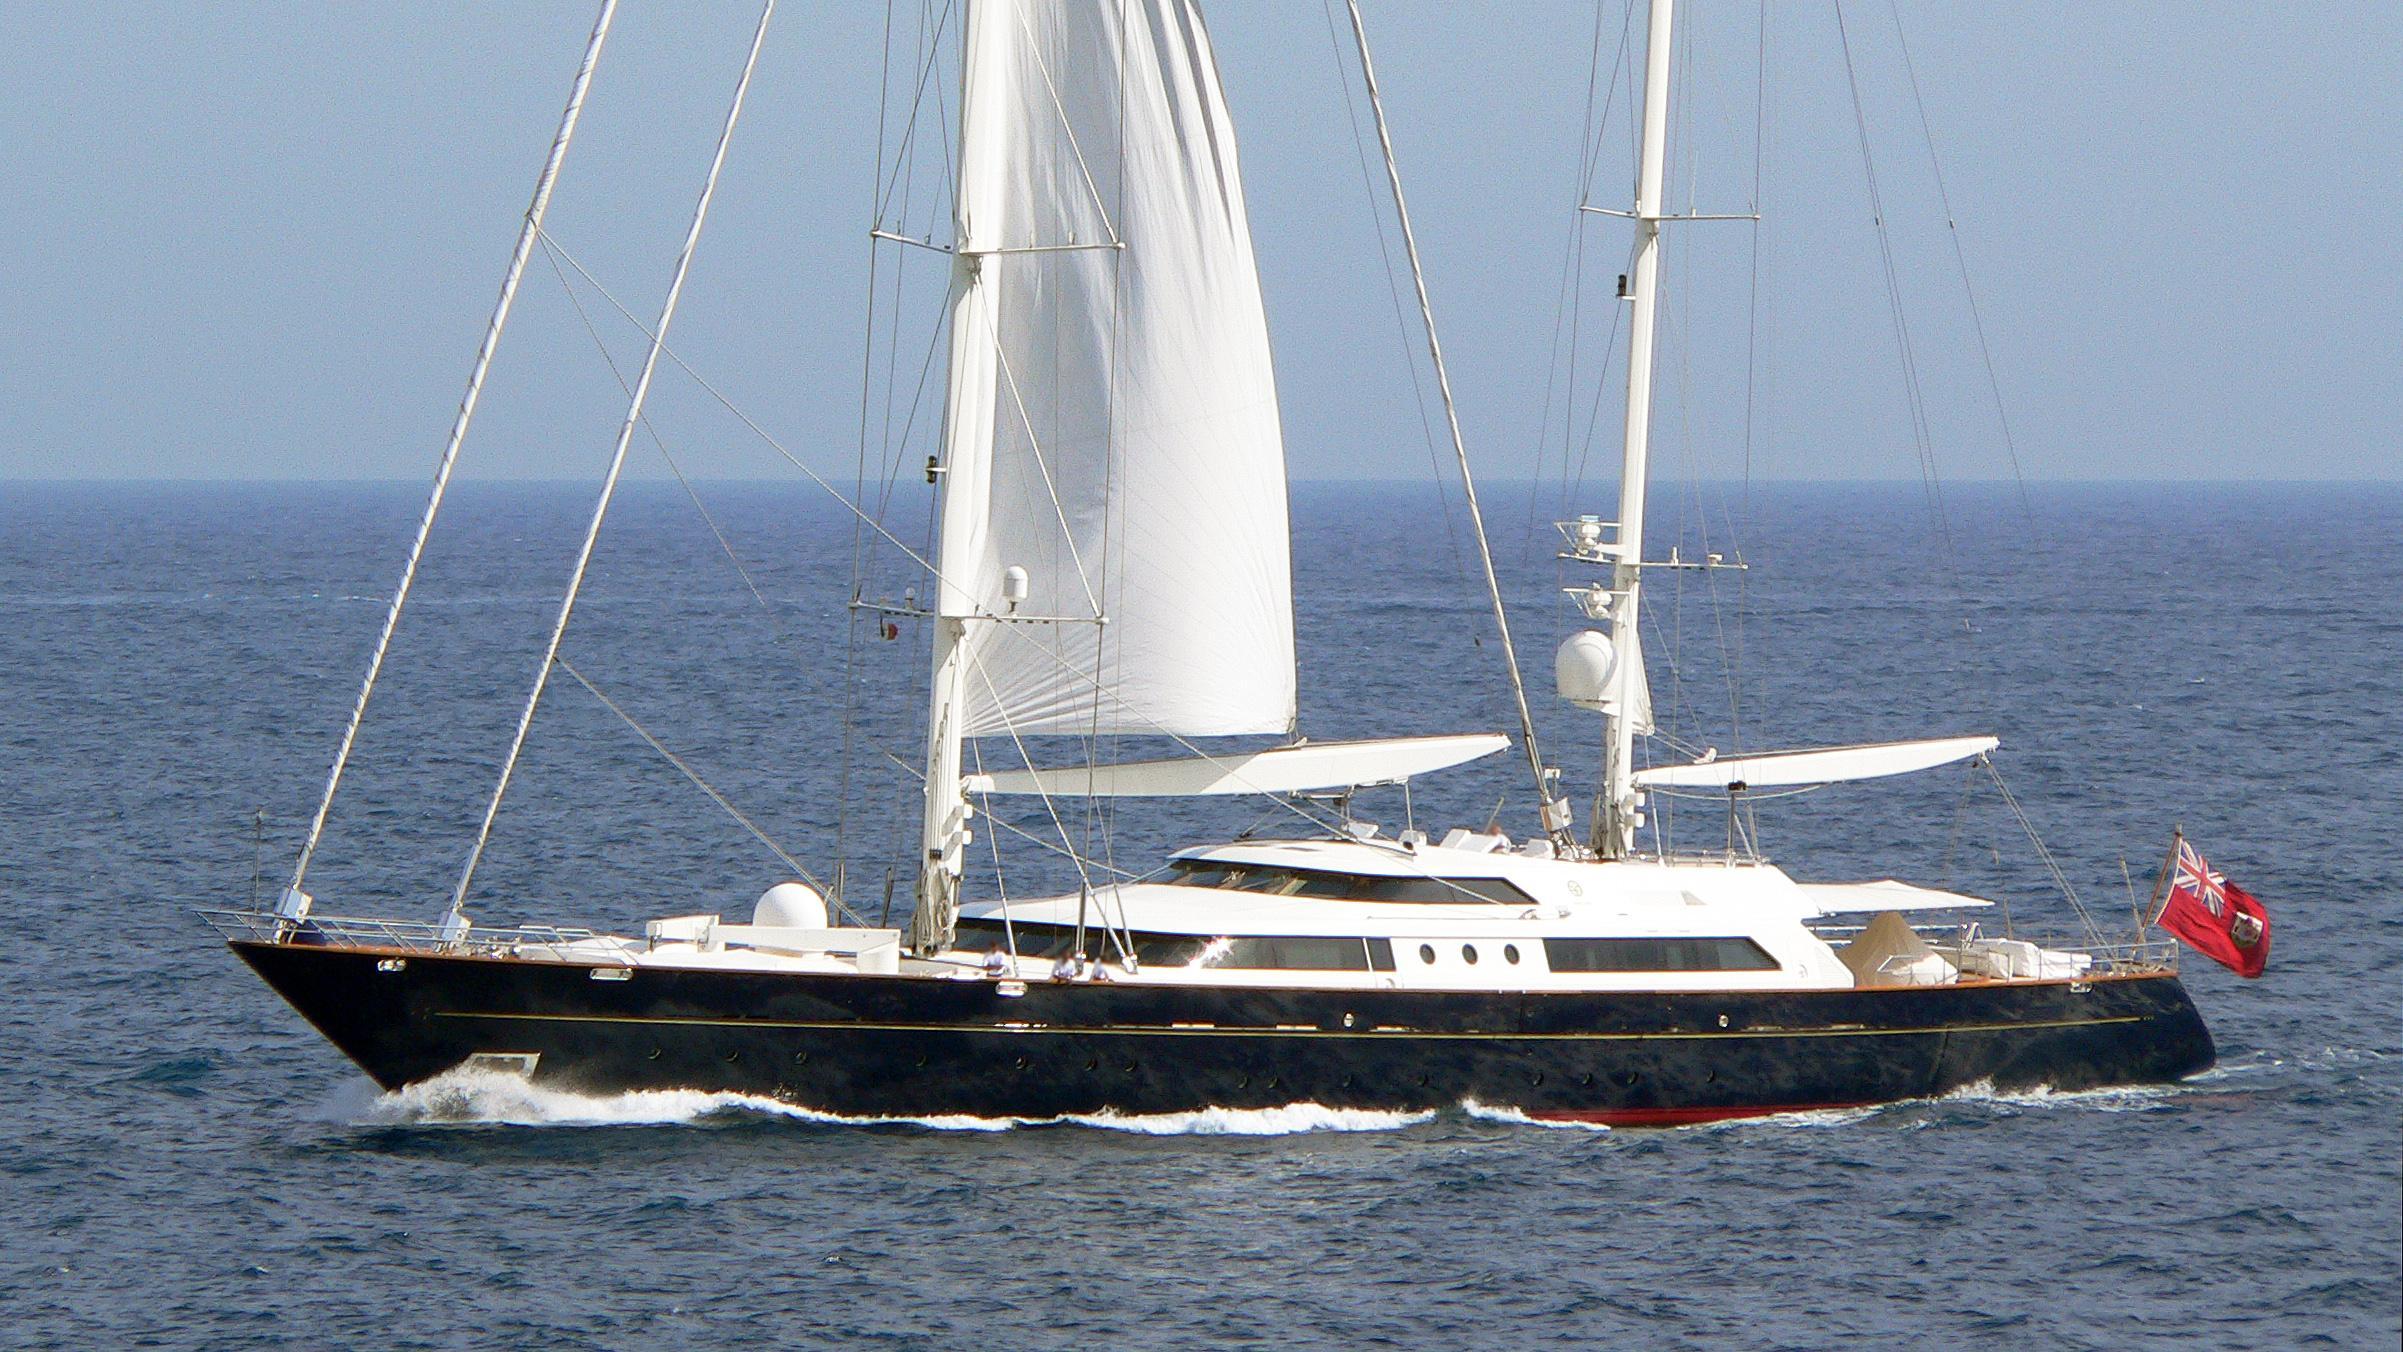 taouey-sailing-yacht-perini-navi-1994-59m-profile-before-refit